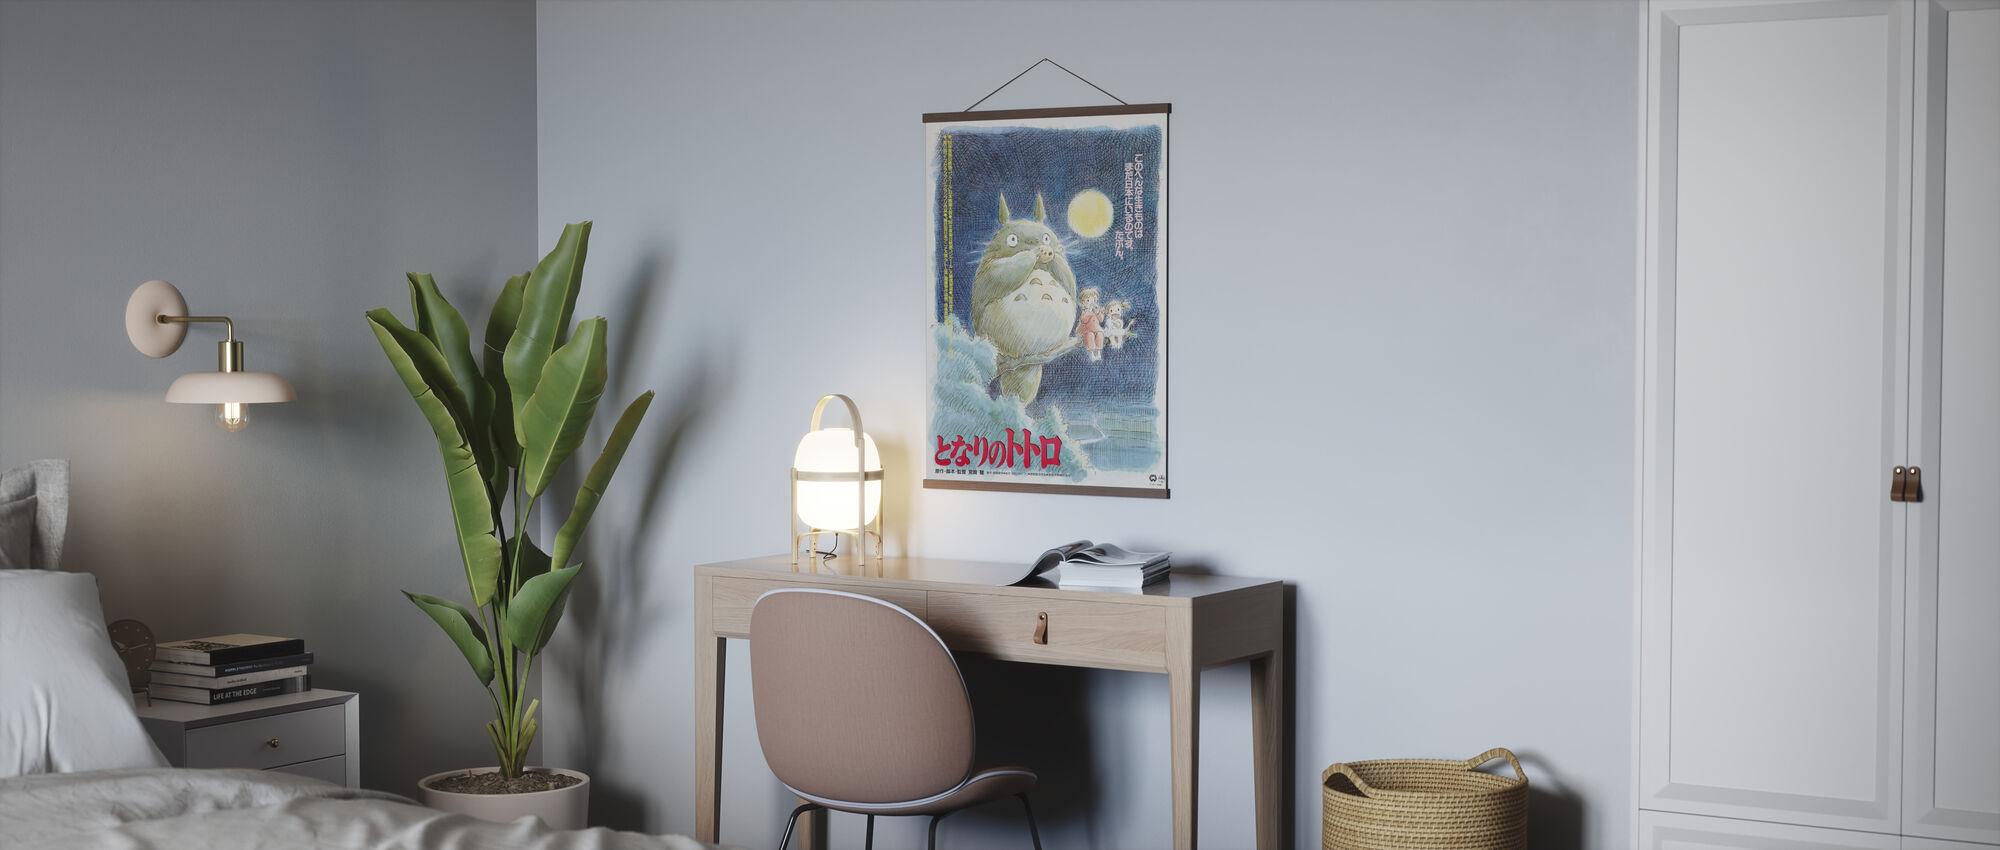 My Neighbor Totoro - Poster - Office